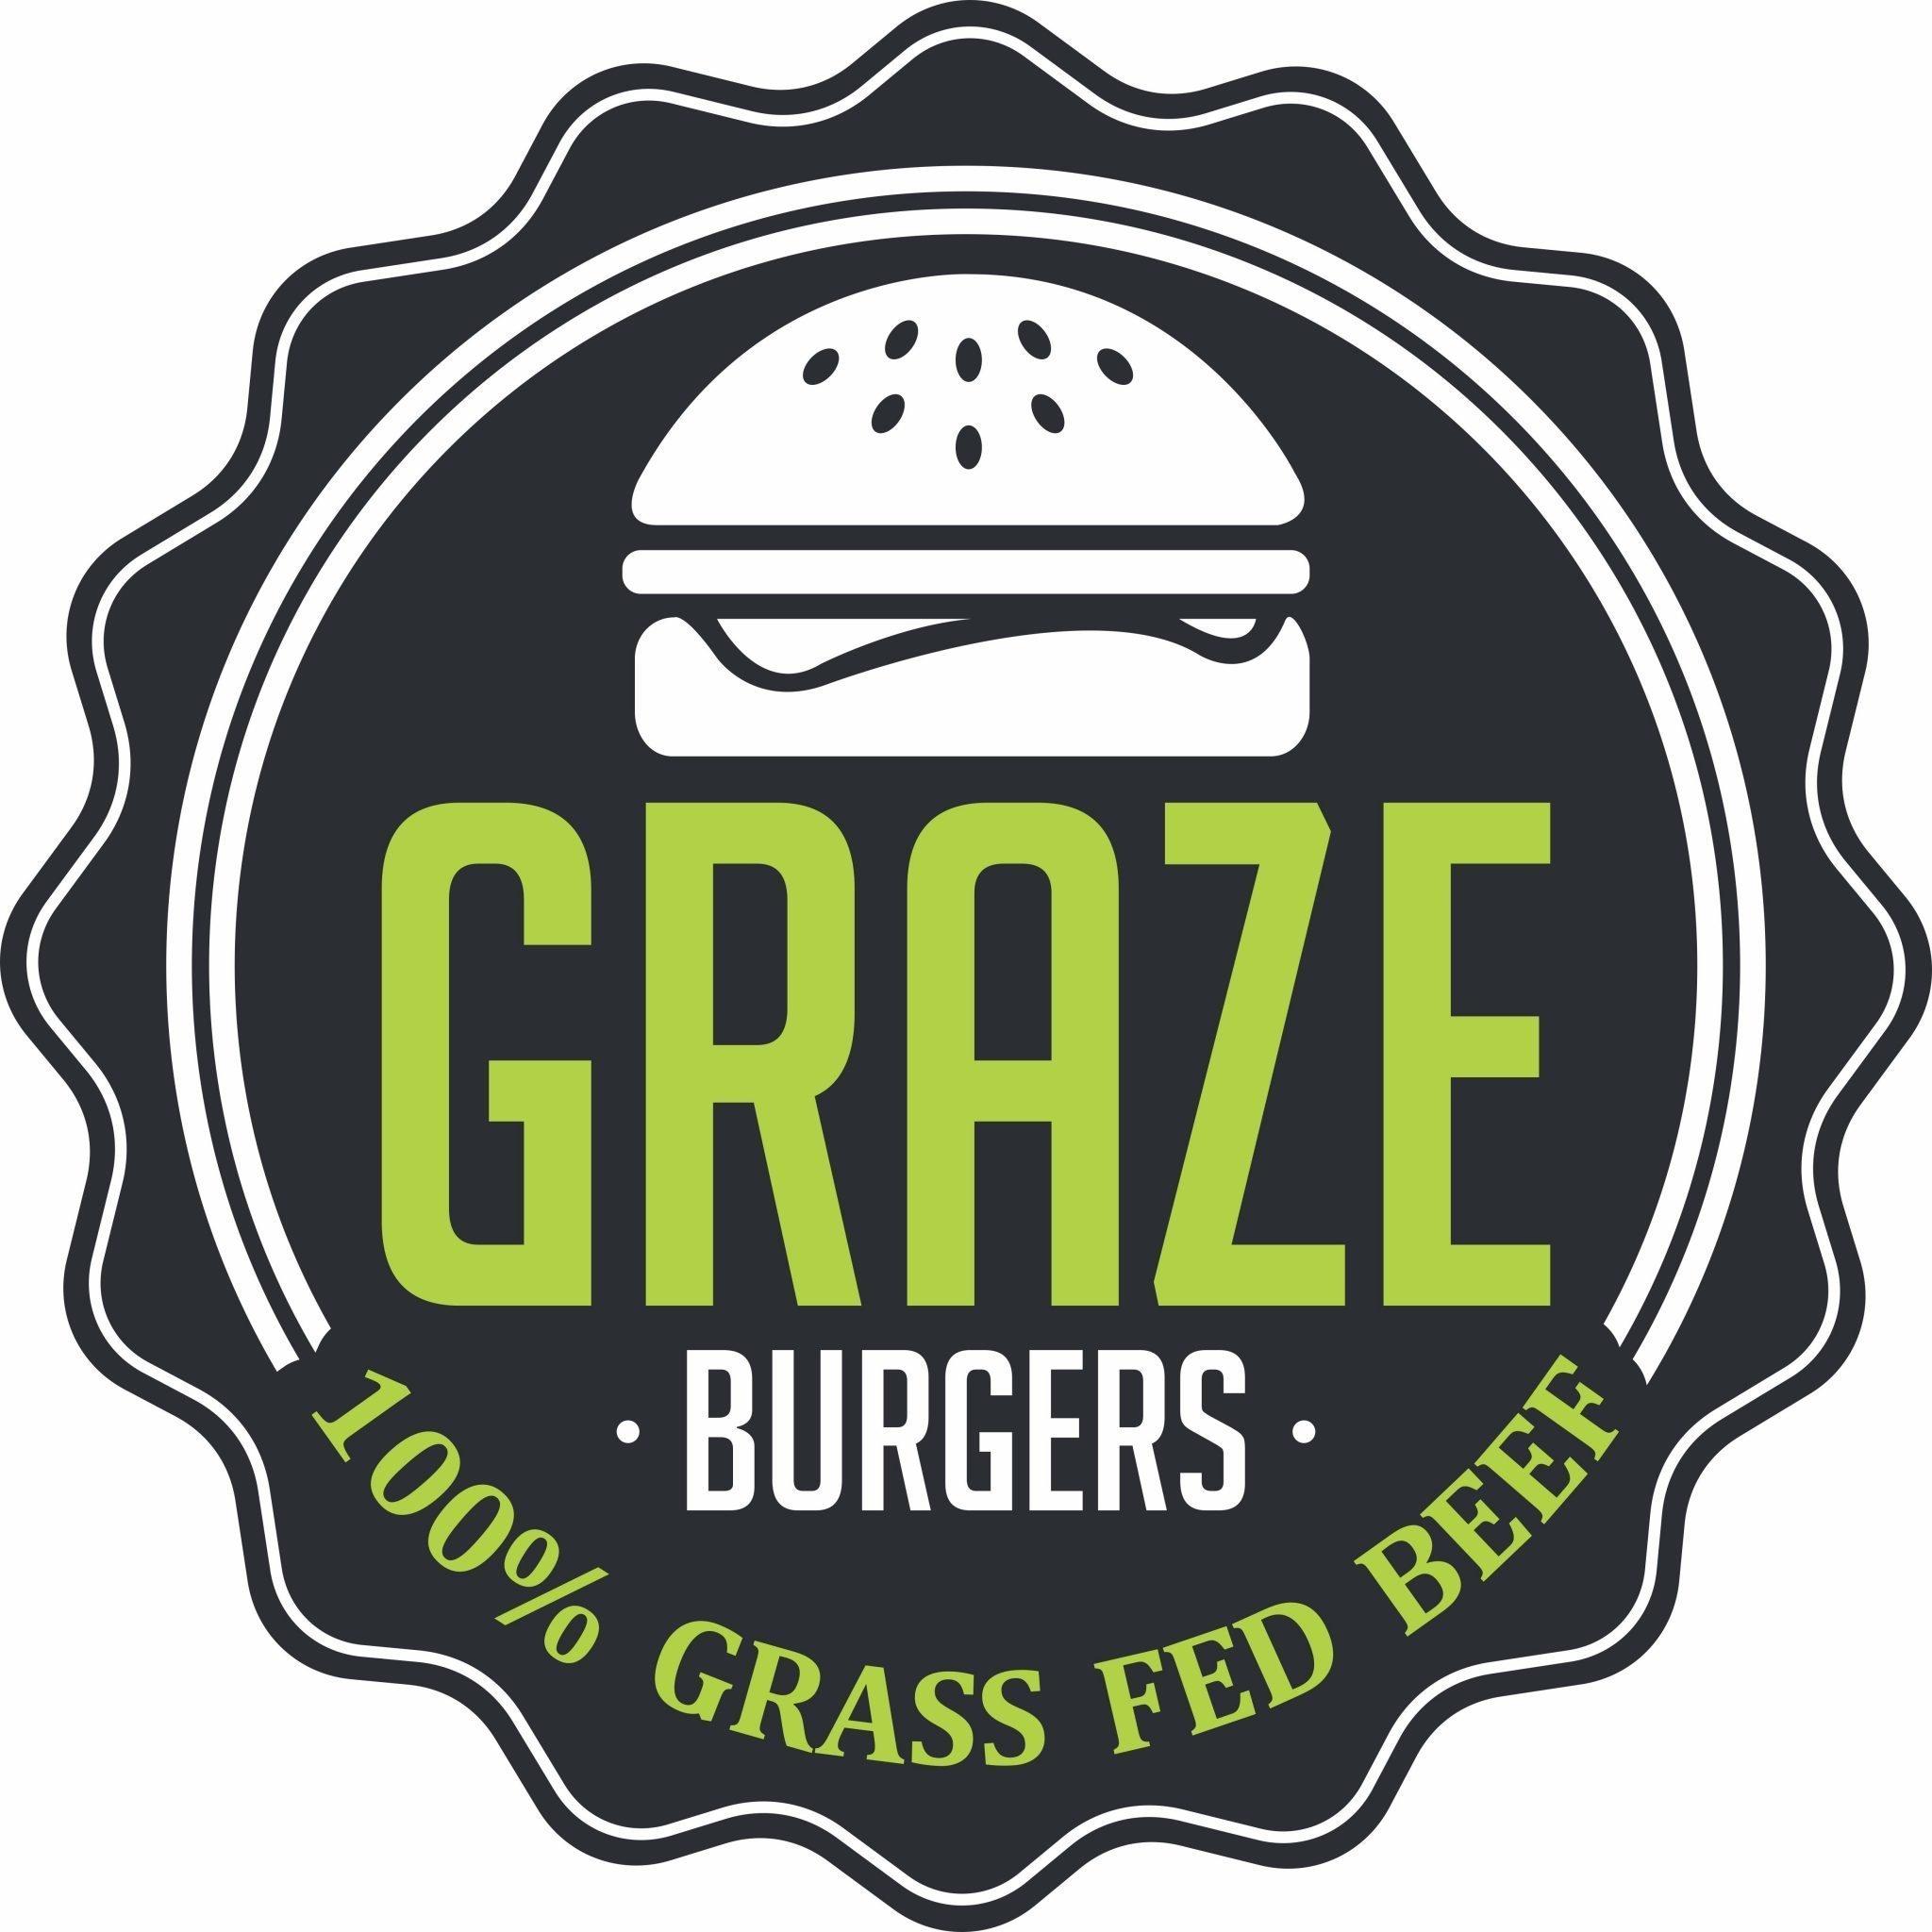 Graze Burgers